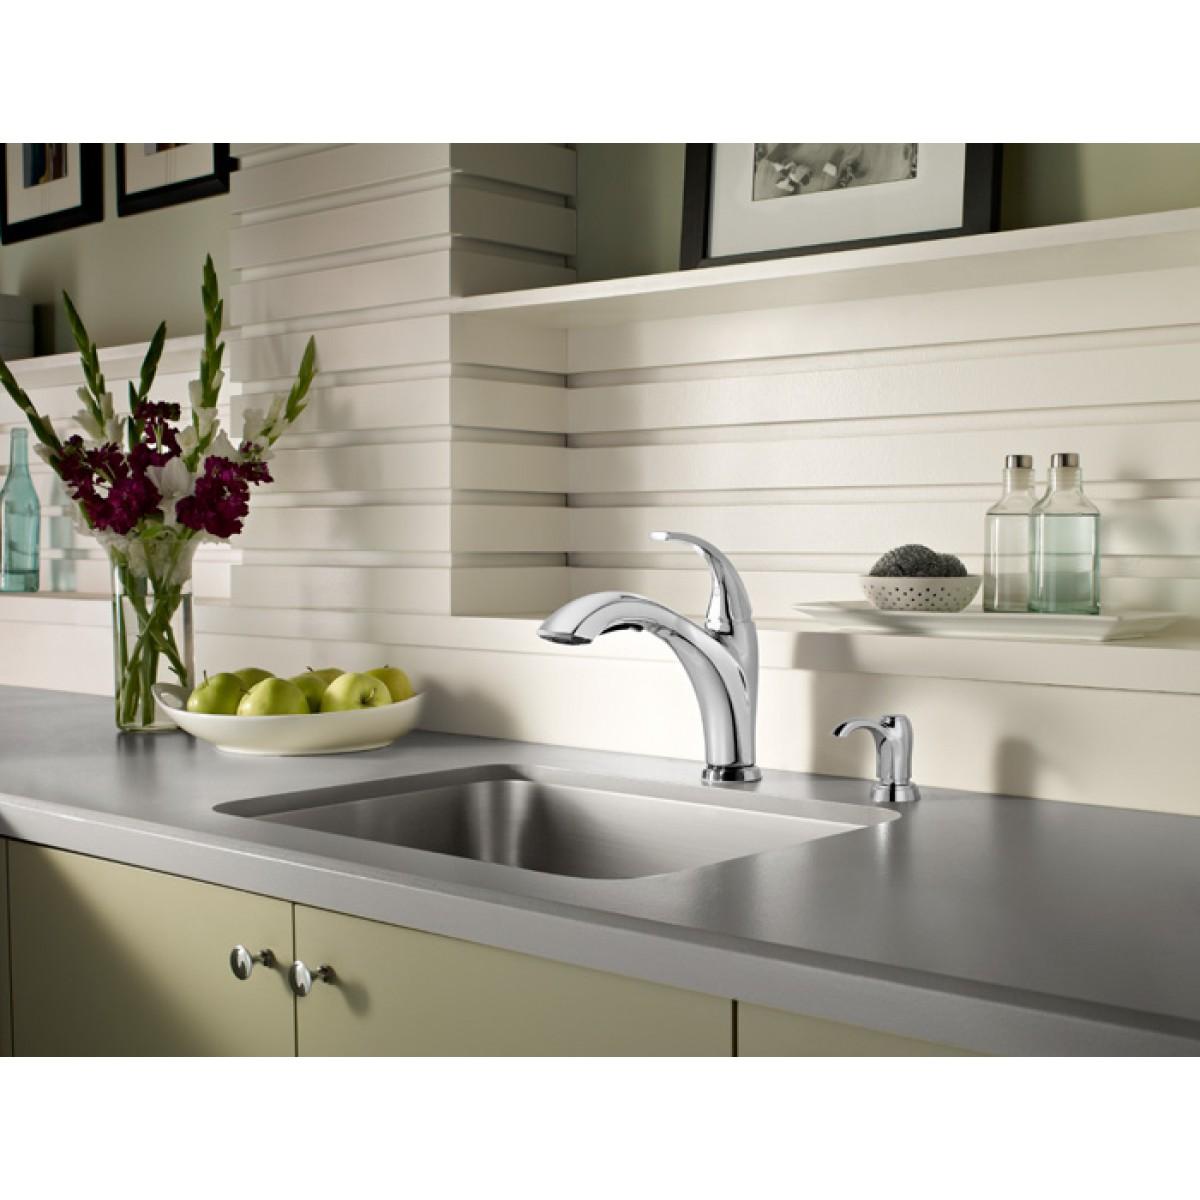 Pfister Selia Lead Free Single Handle Pull Out Chrome Kitchen ...